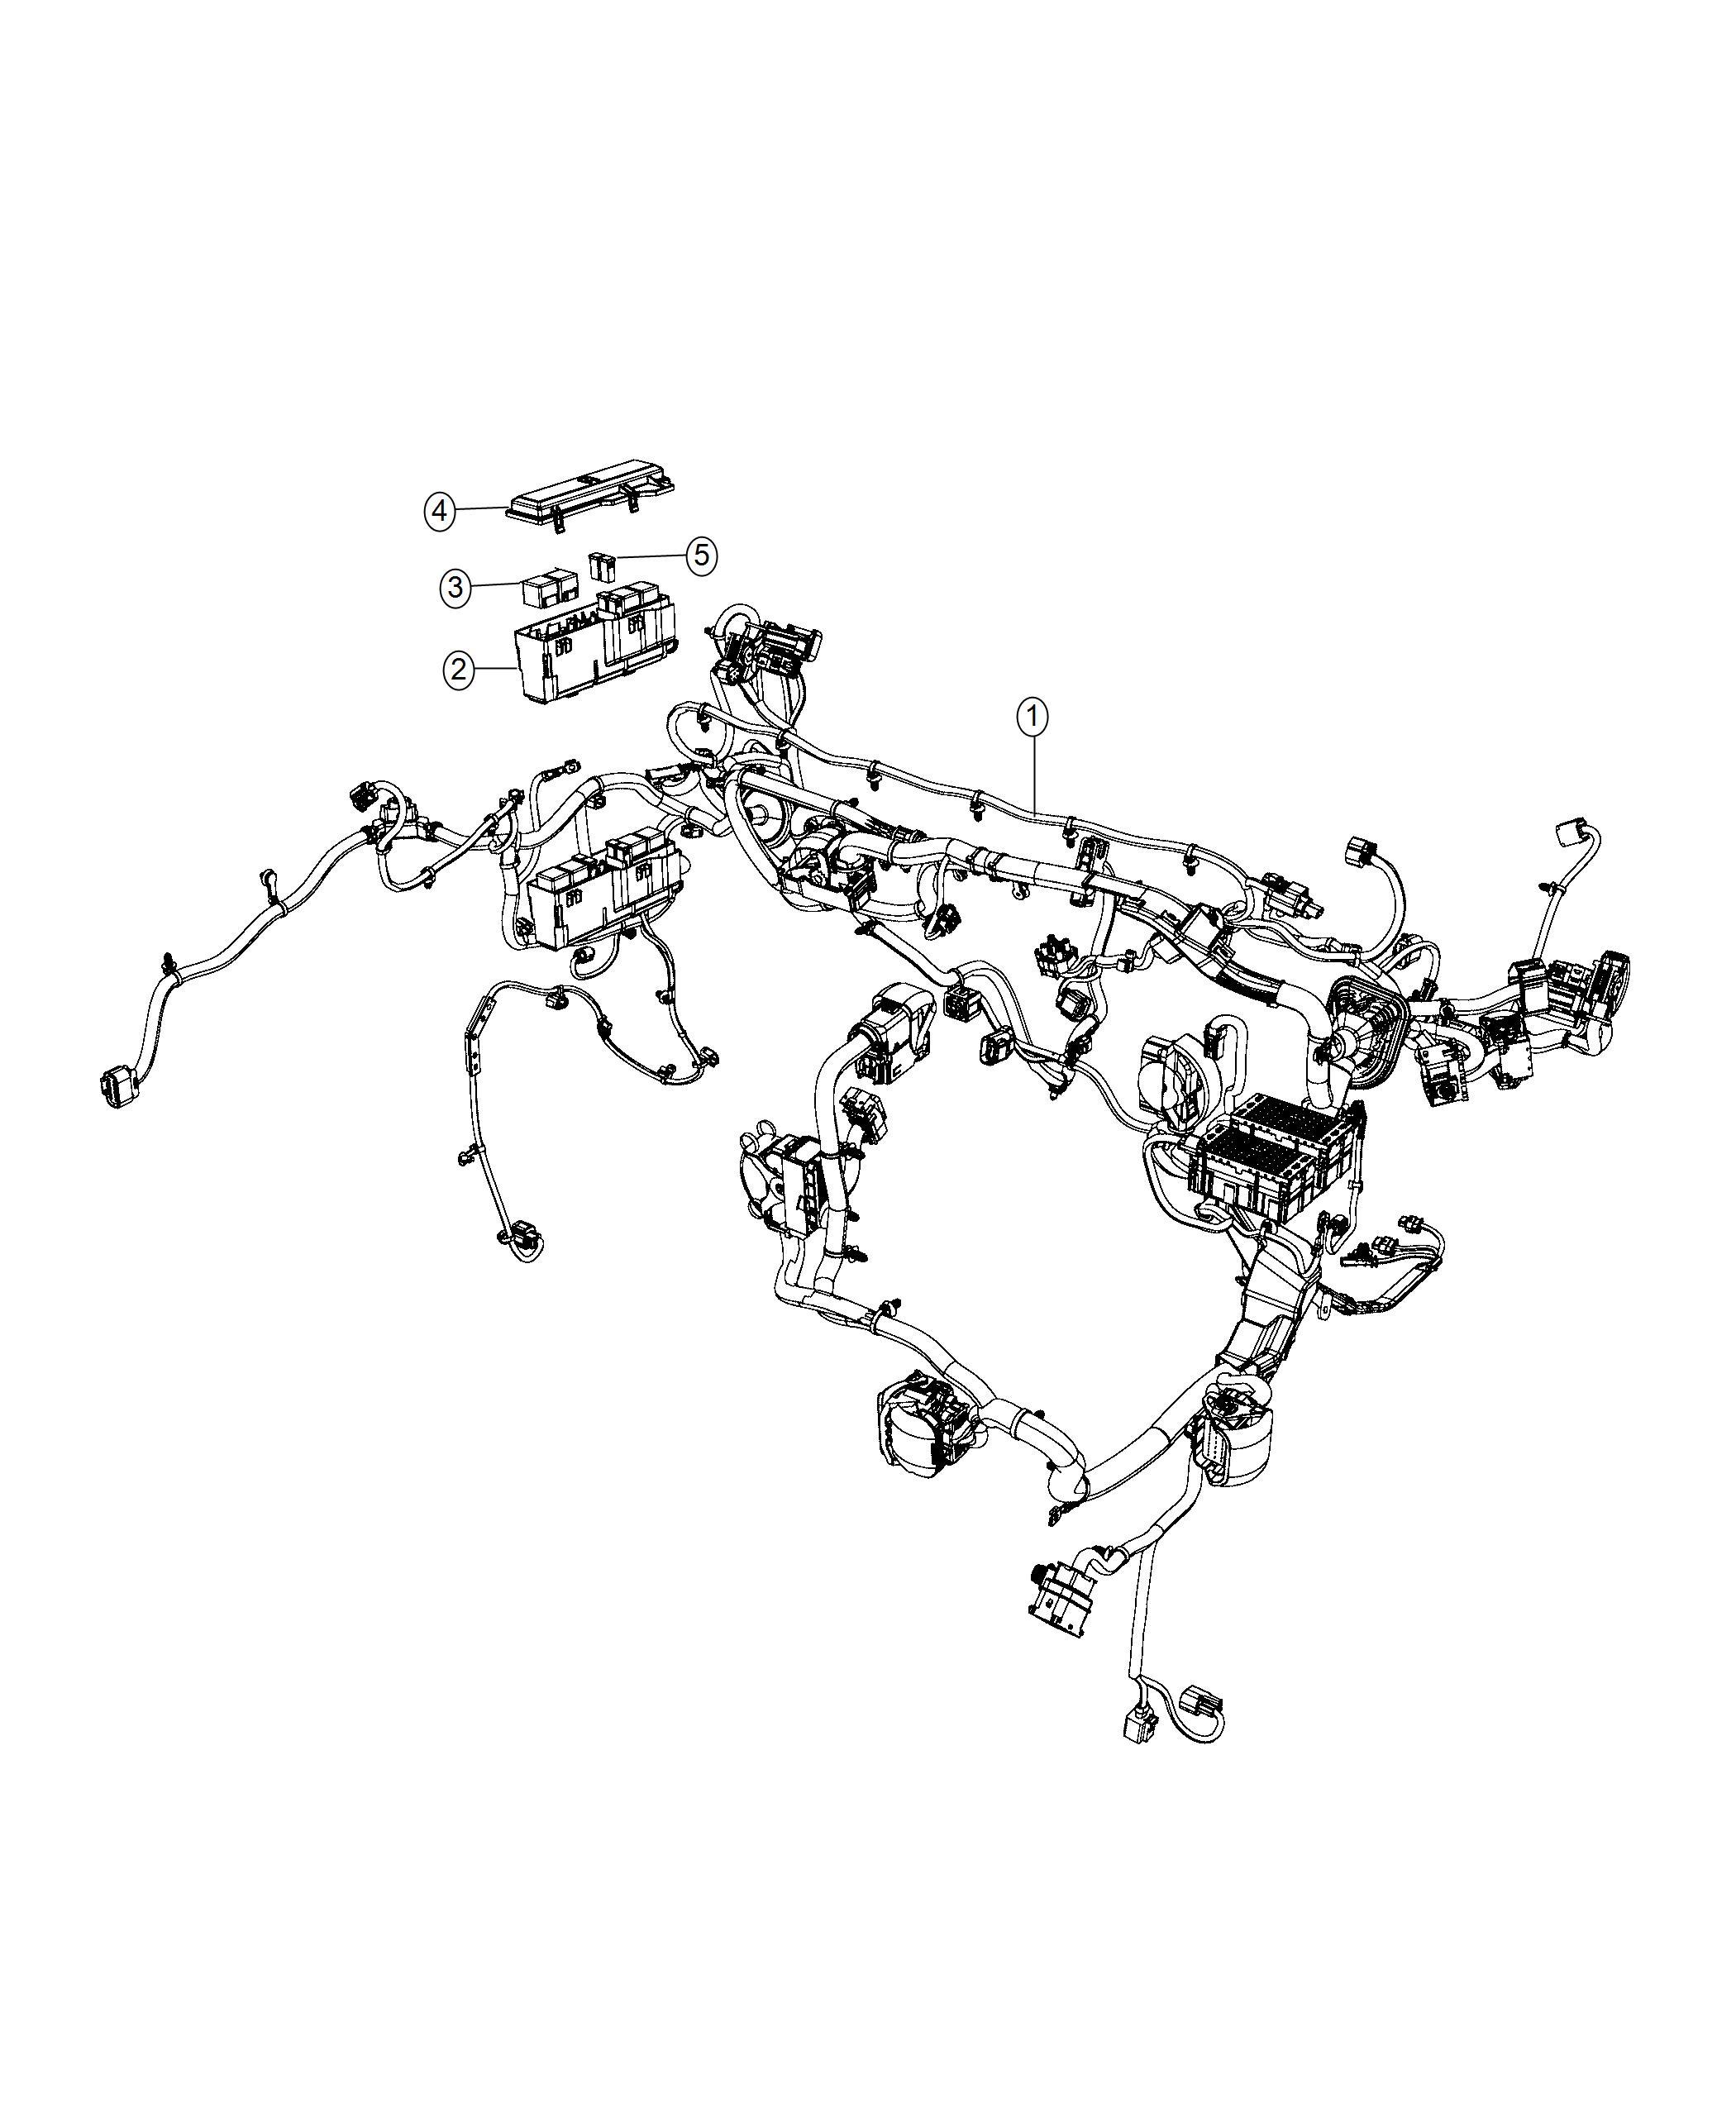 Jeep Cherokee Wiring. Dash. [gasoline particulate filter